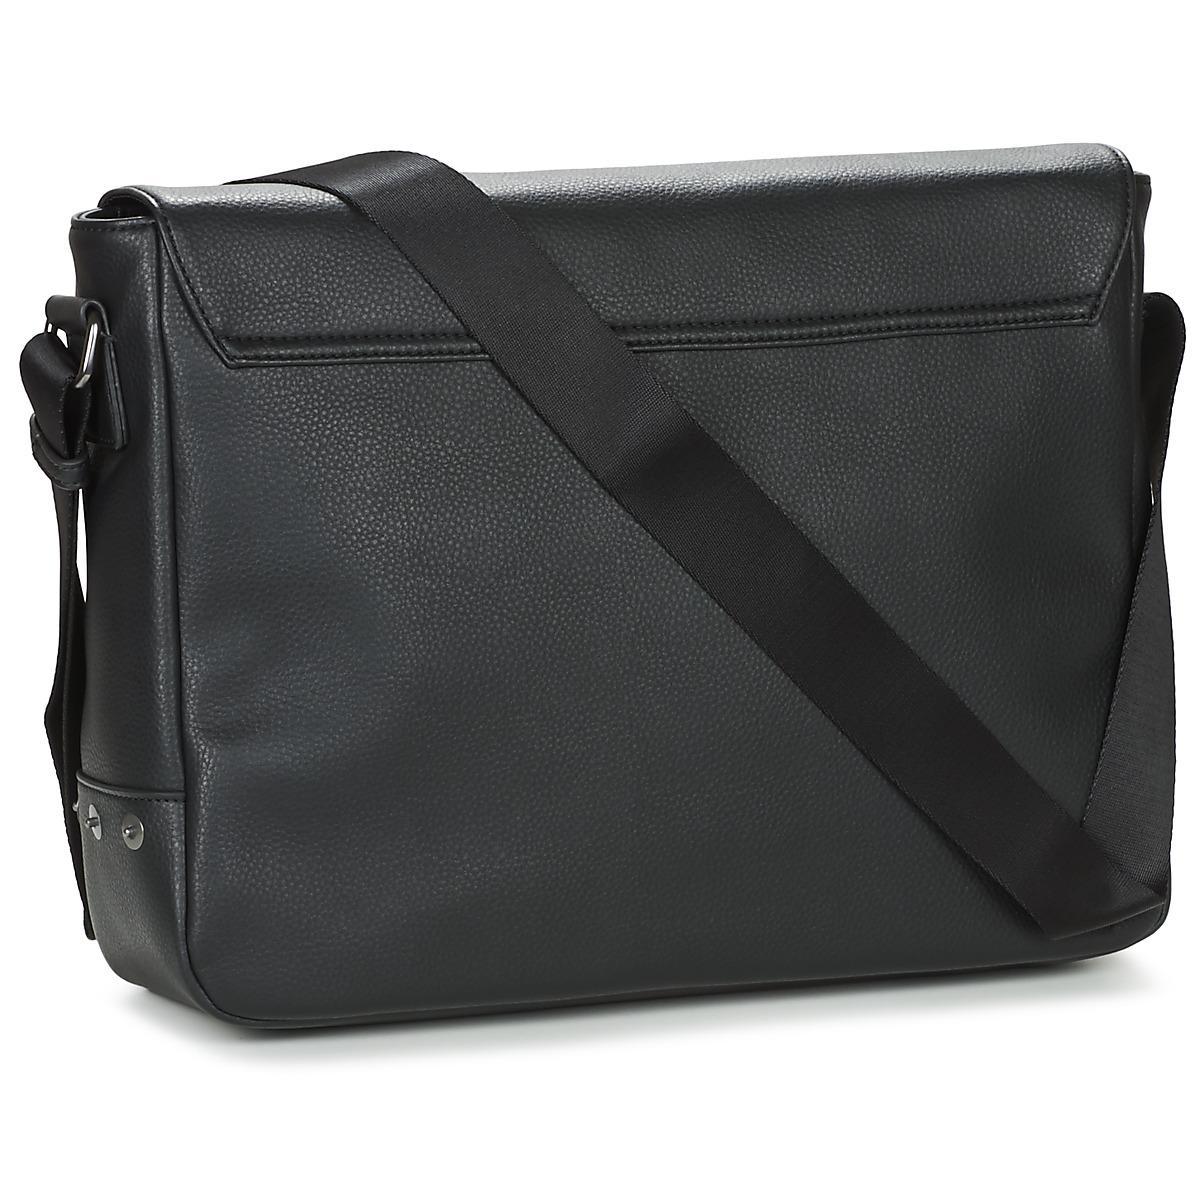 e41984a109b6 Armani Jeans Gram Men s Messenger Bag In Black in Black for Men - Lyst